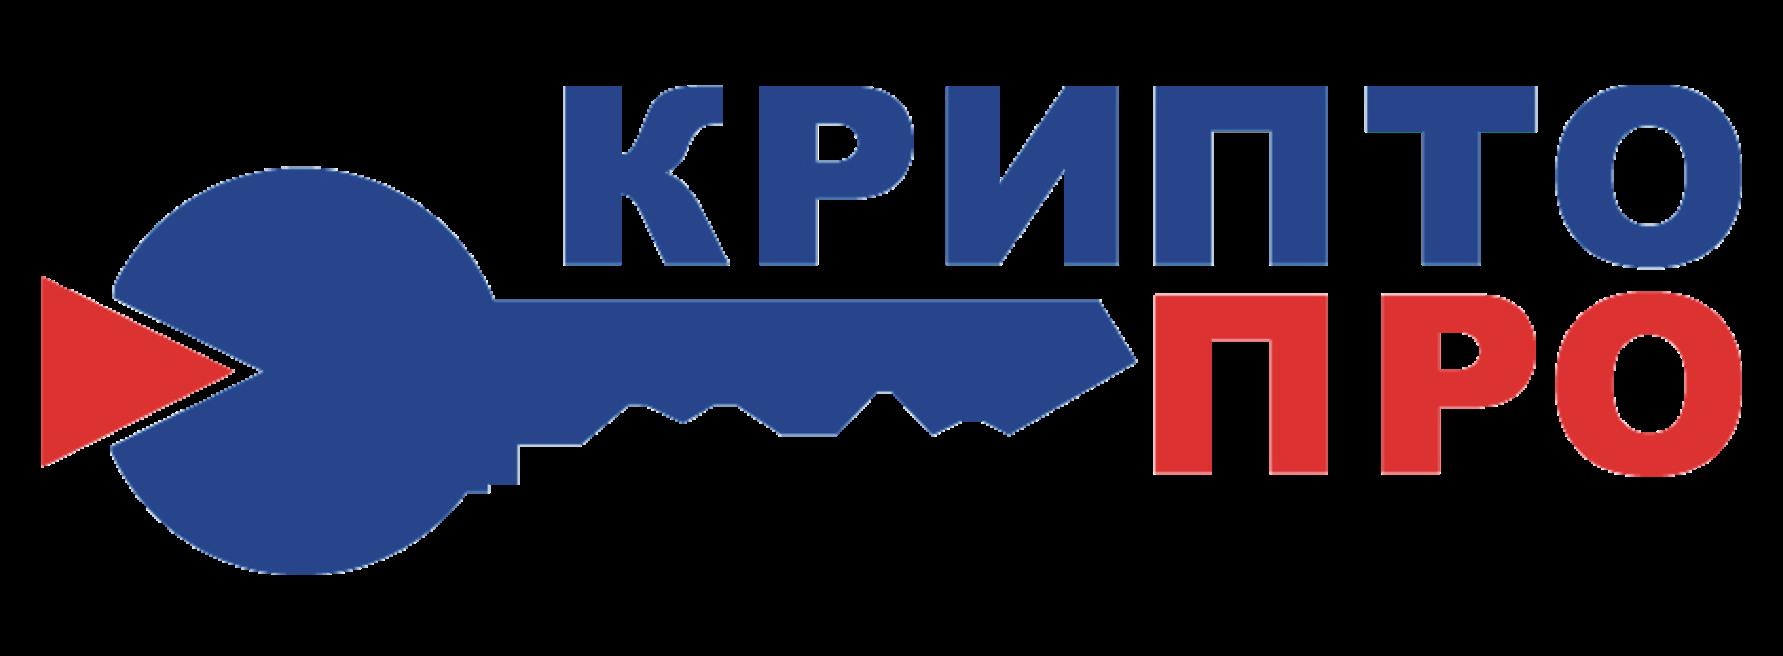 Криптопро с 1 января 2019 года запрещено фото